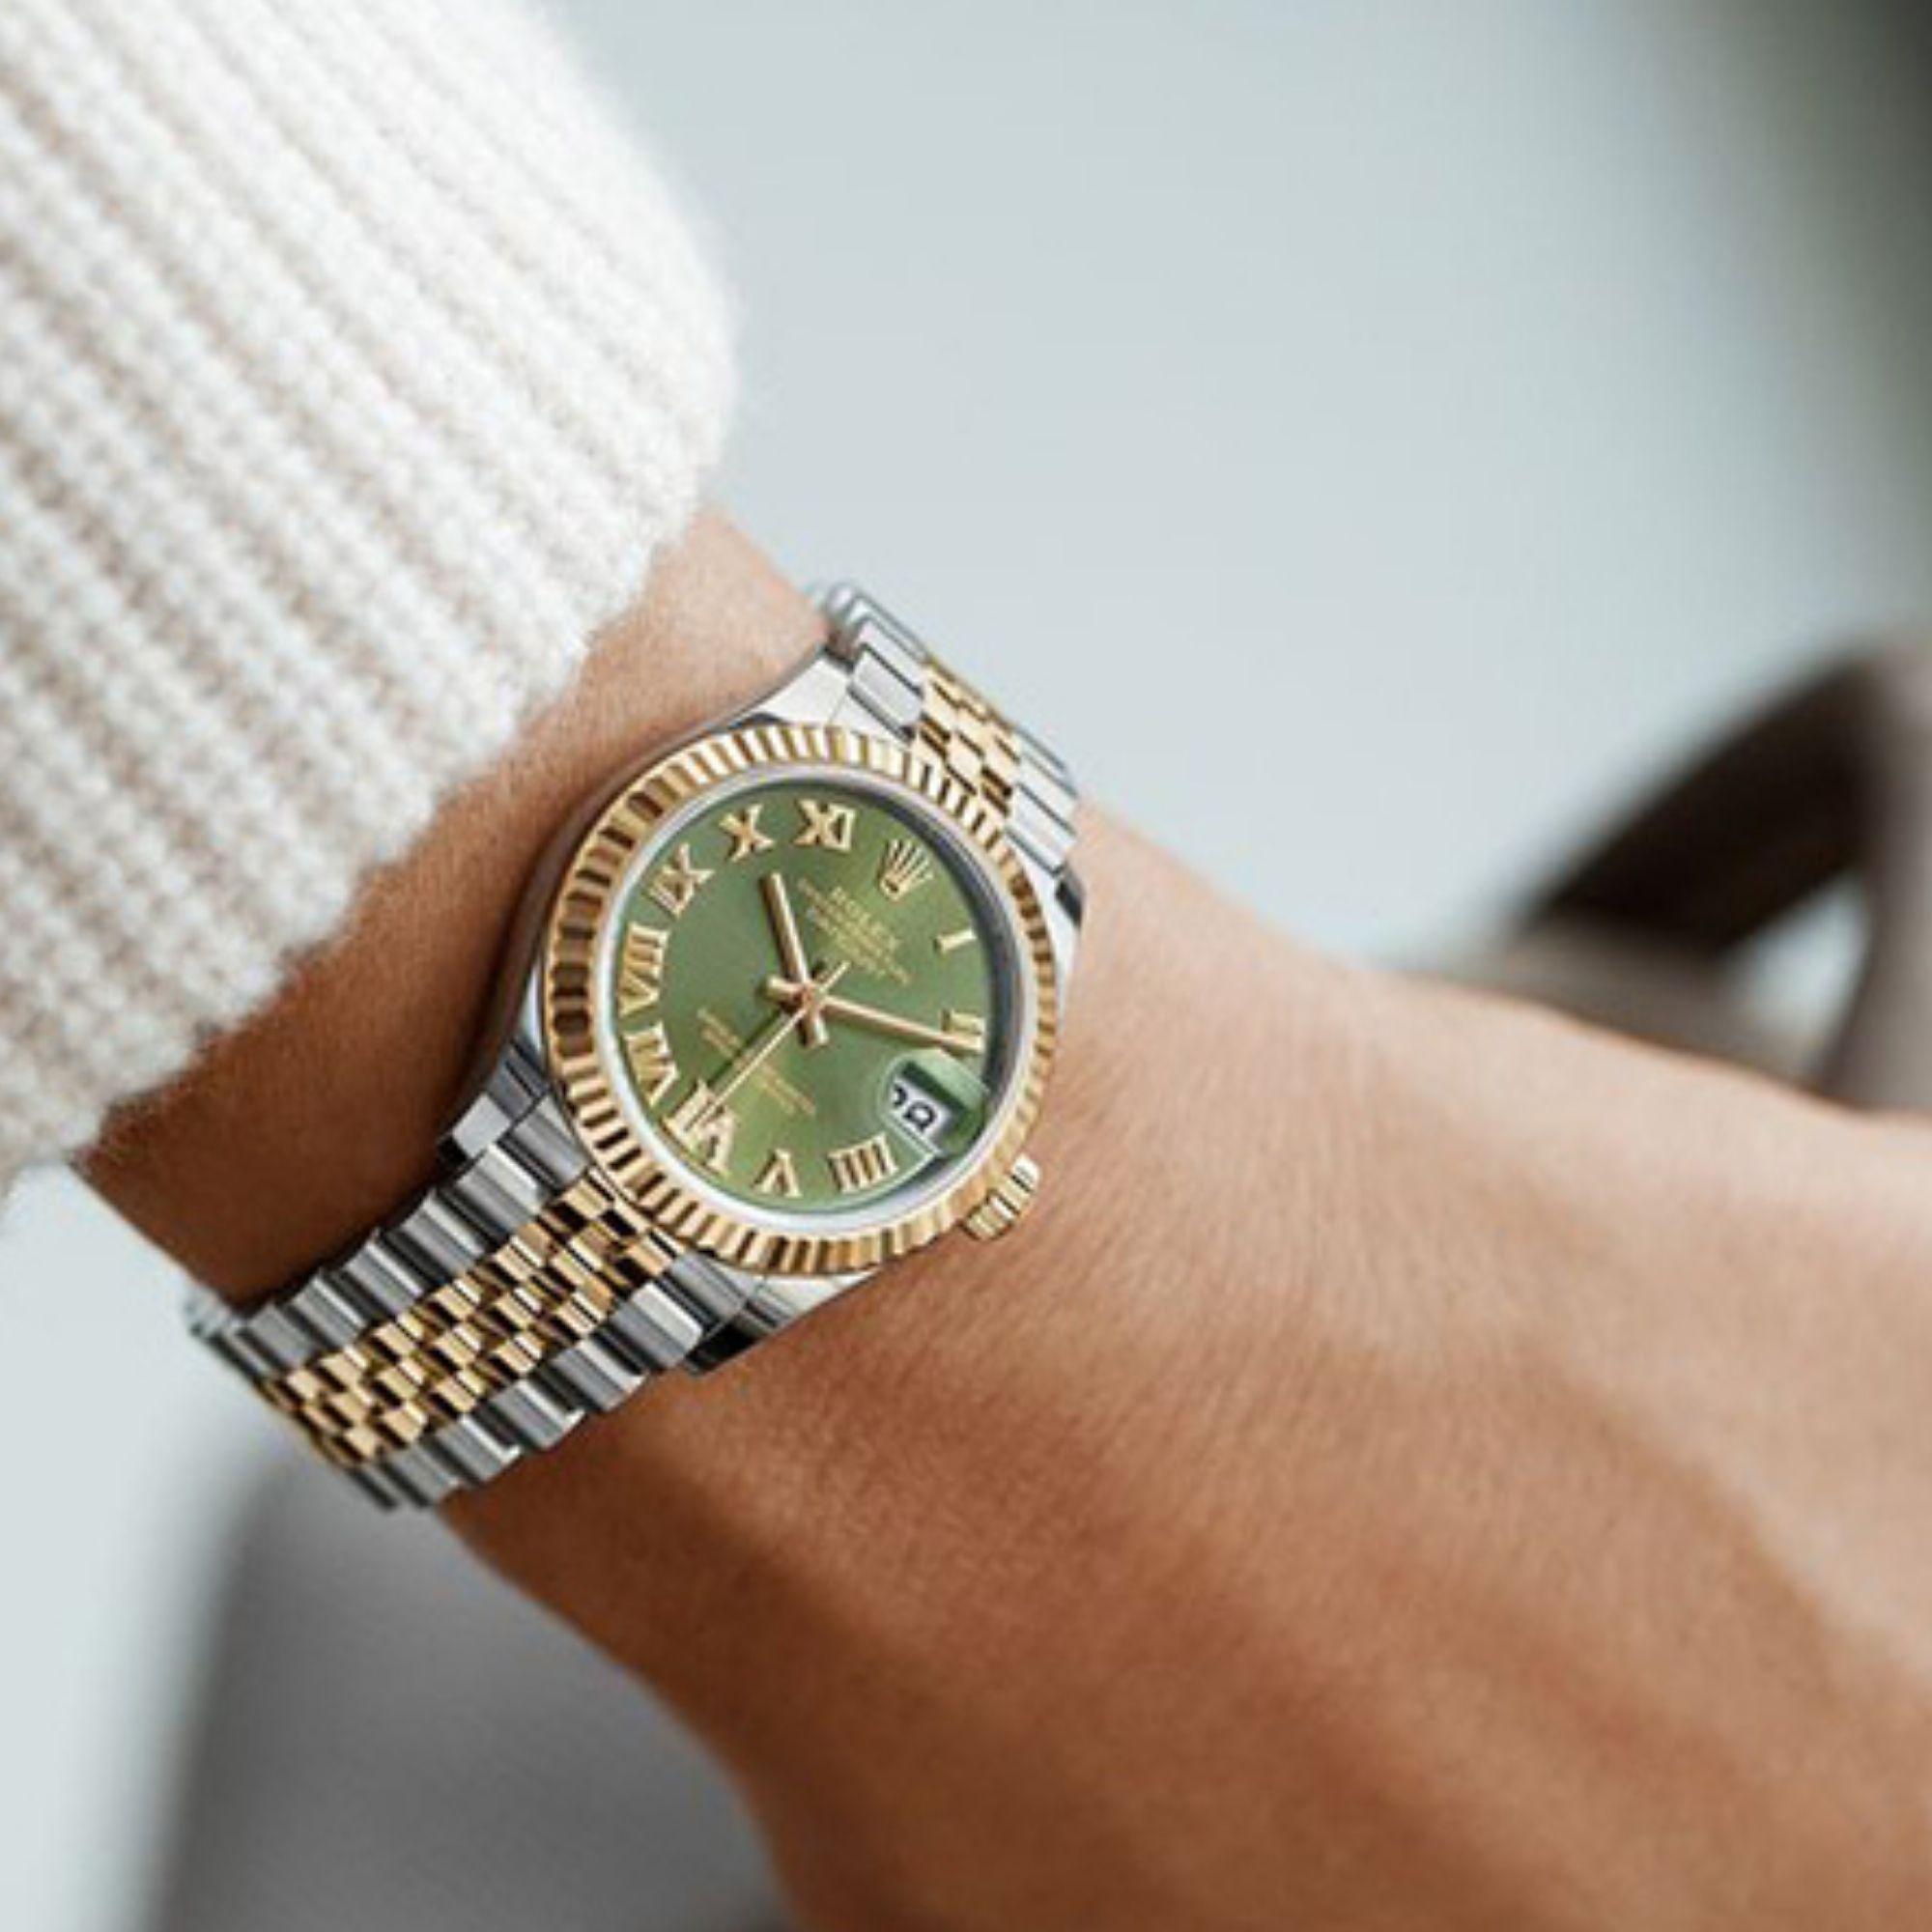 Rolex watch with light green face